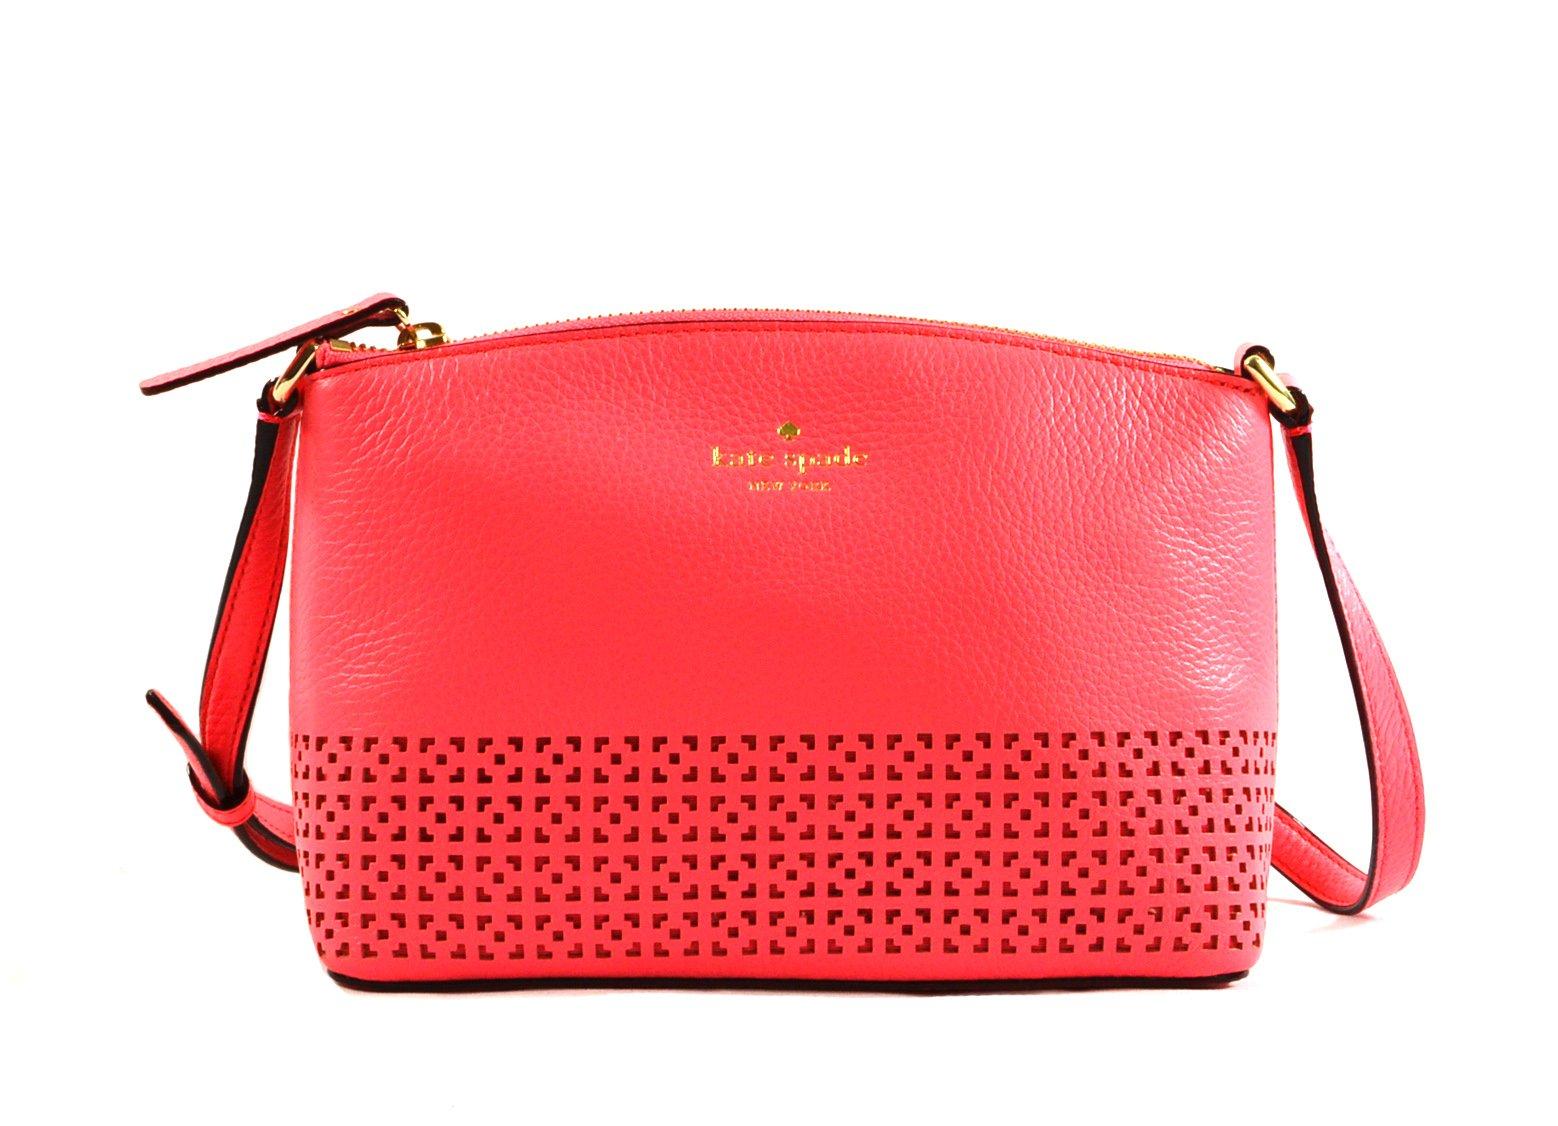 Kate Spade New York Wakefield Lane Millie Crossbody Bag Handbag Purse (Red)